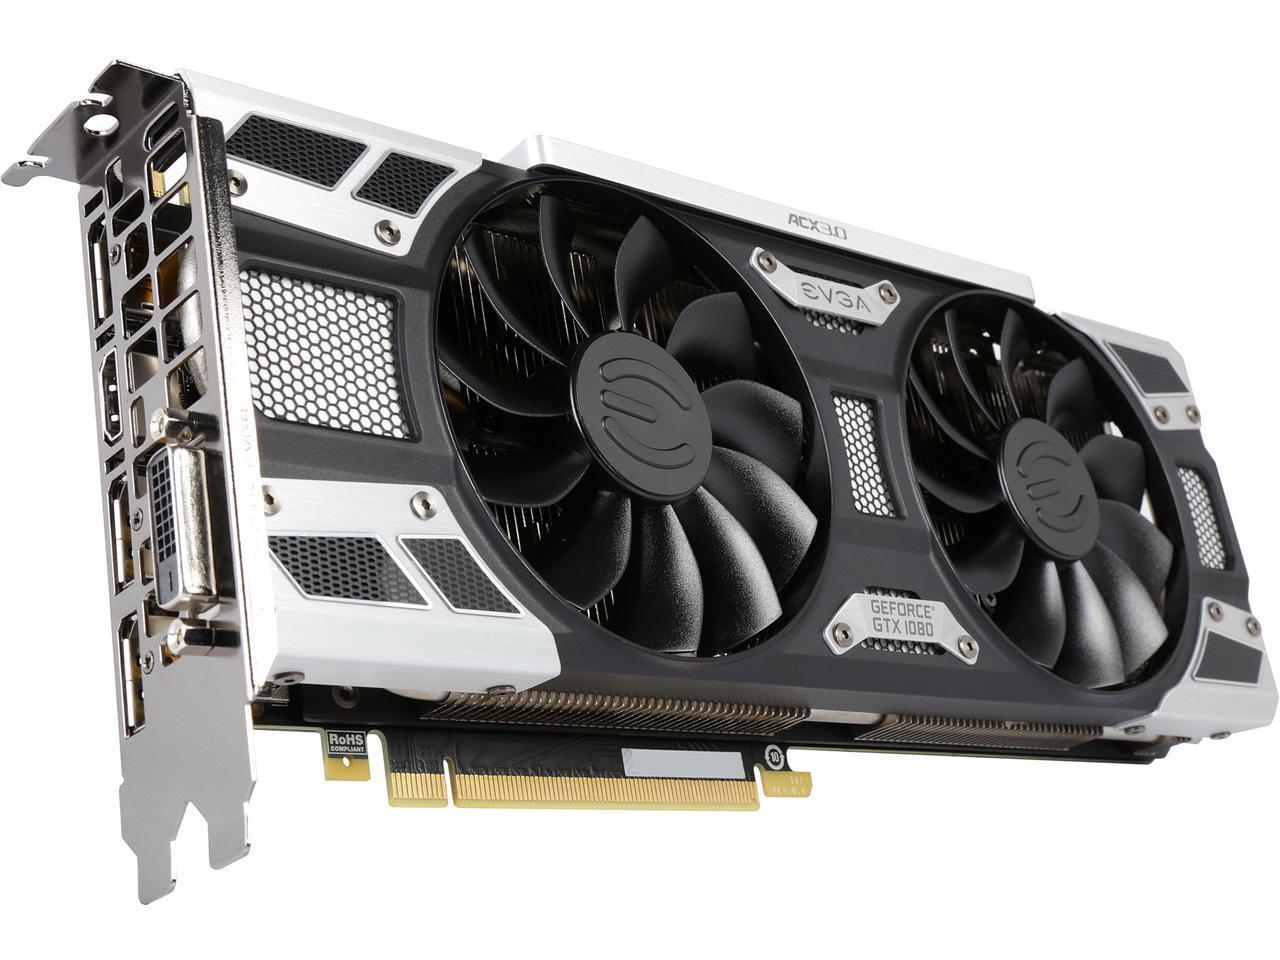 EVGA GeForce GTX 1080 SC Gaming 8GB GDDR5X Video Card $490 after $30 Rebate + Free S/H